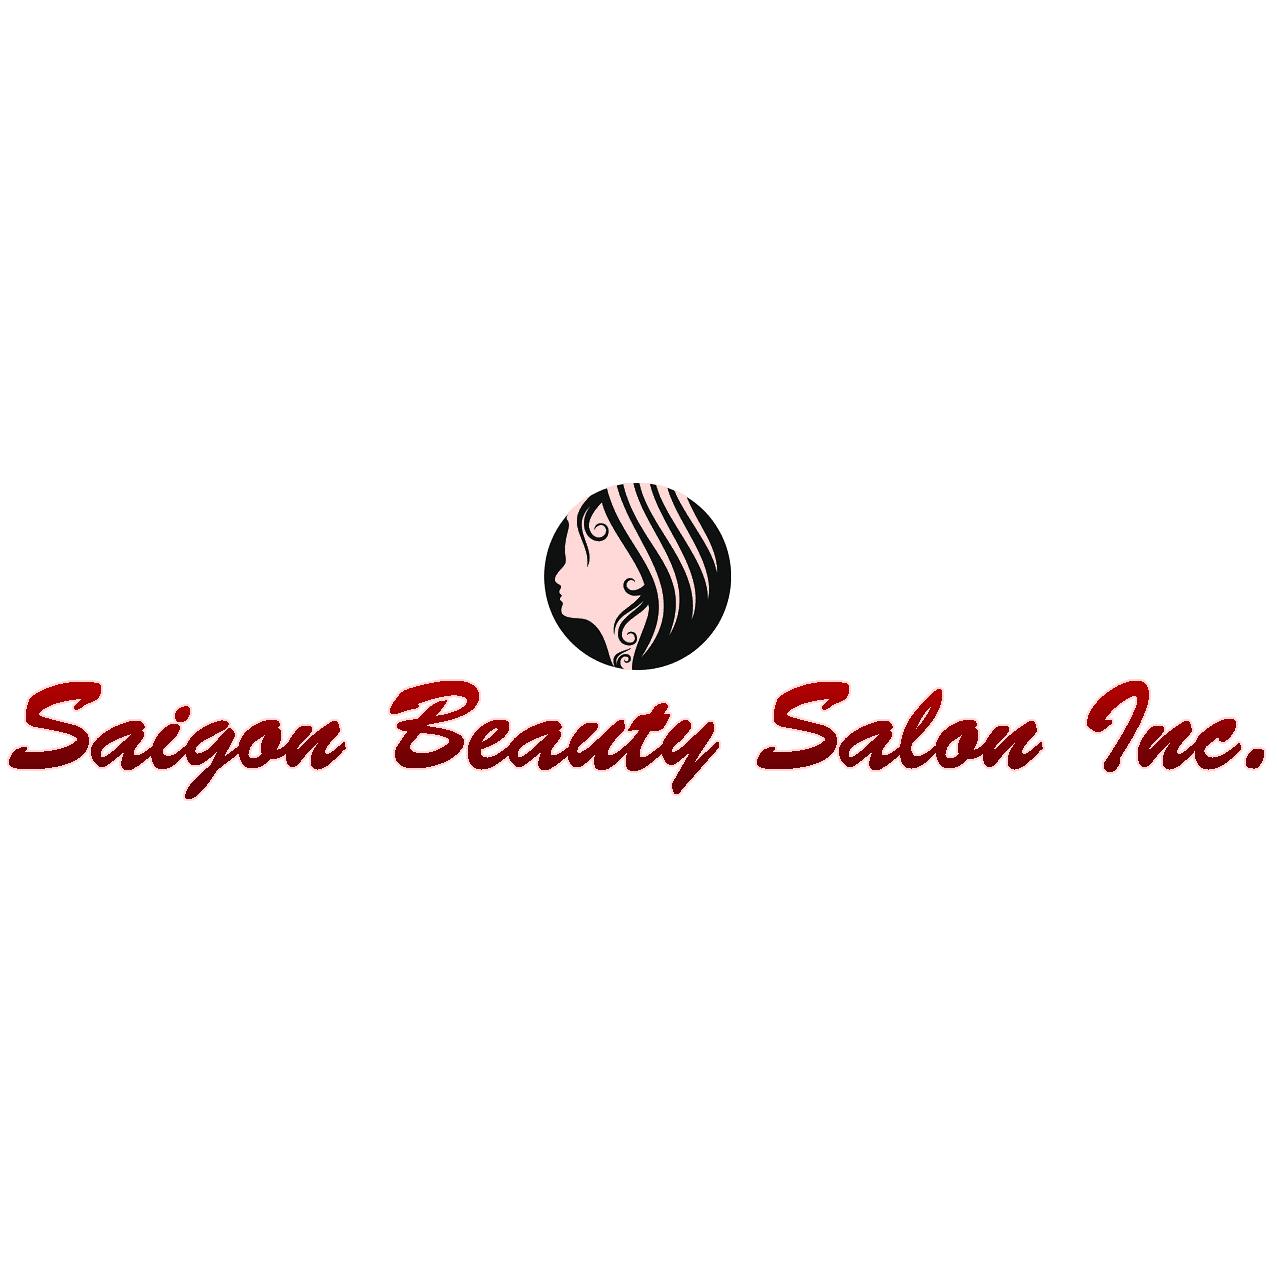 Saigon Beauty Salon Inc.